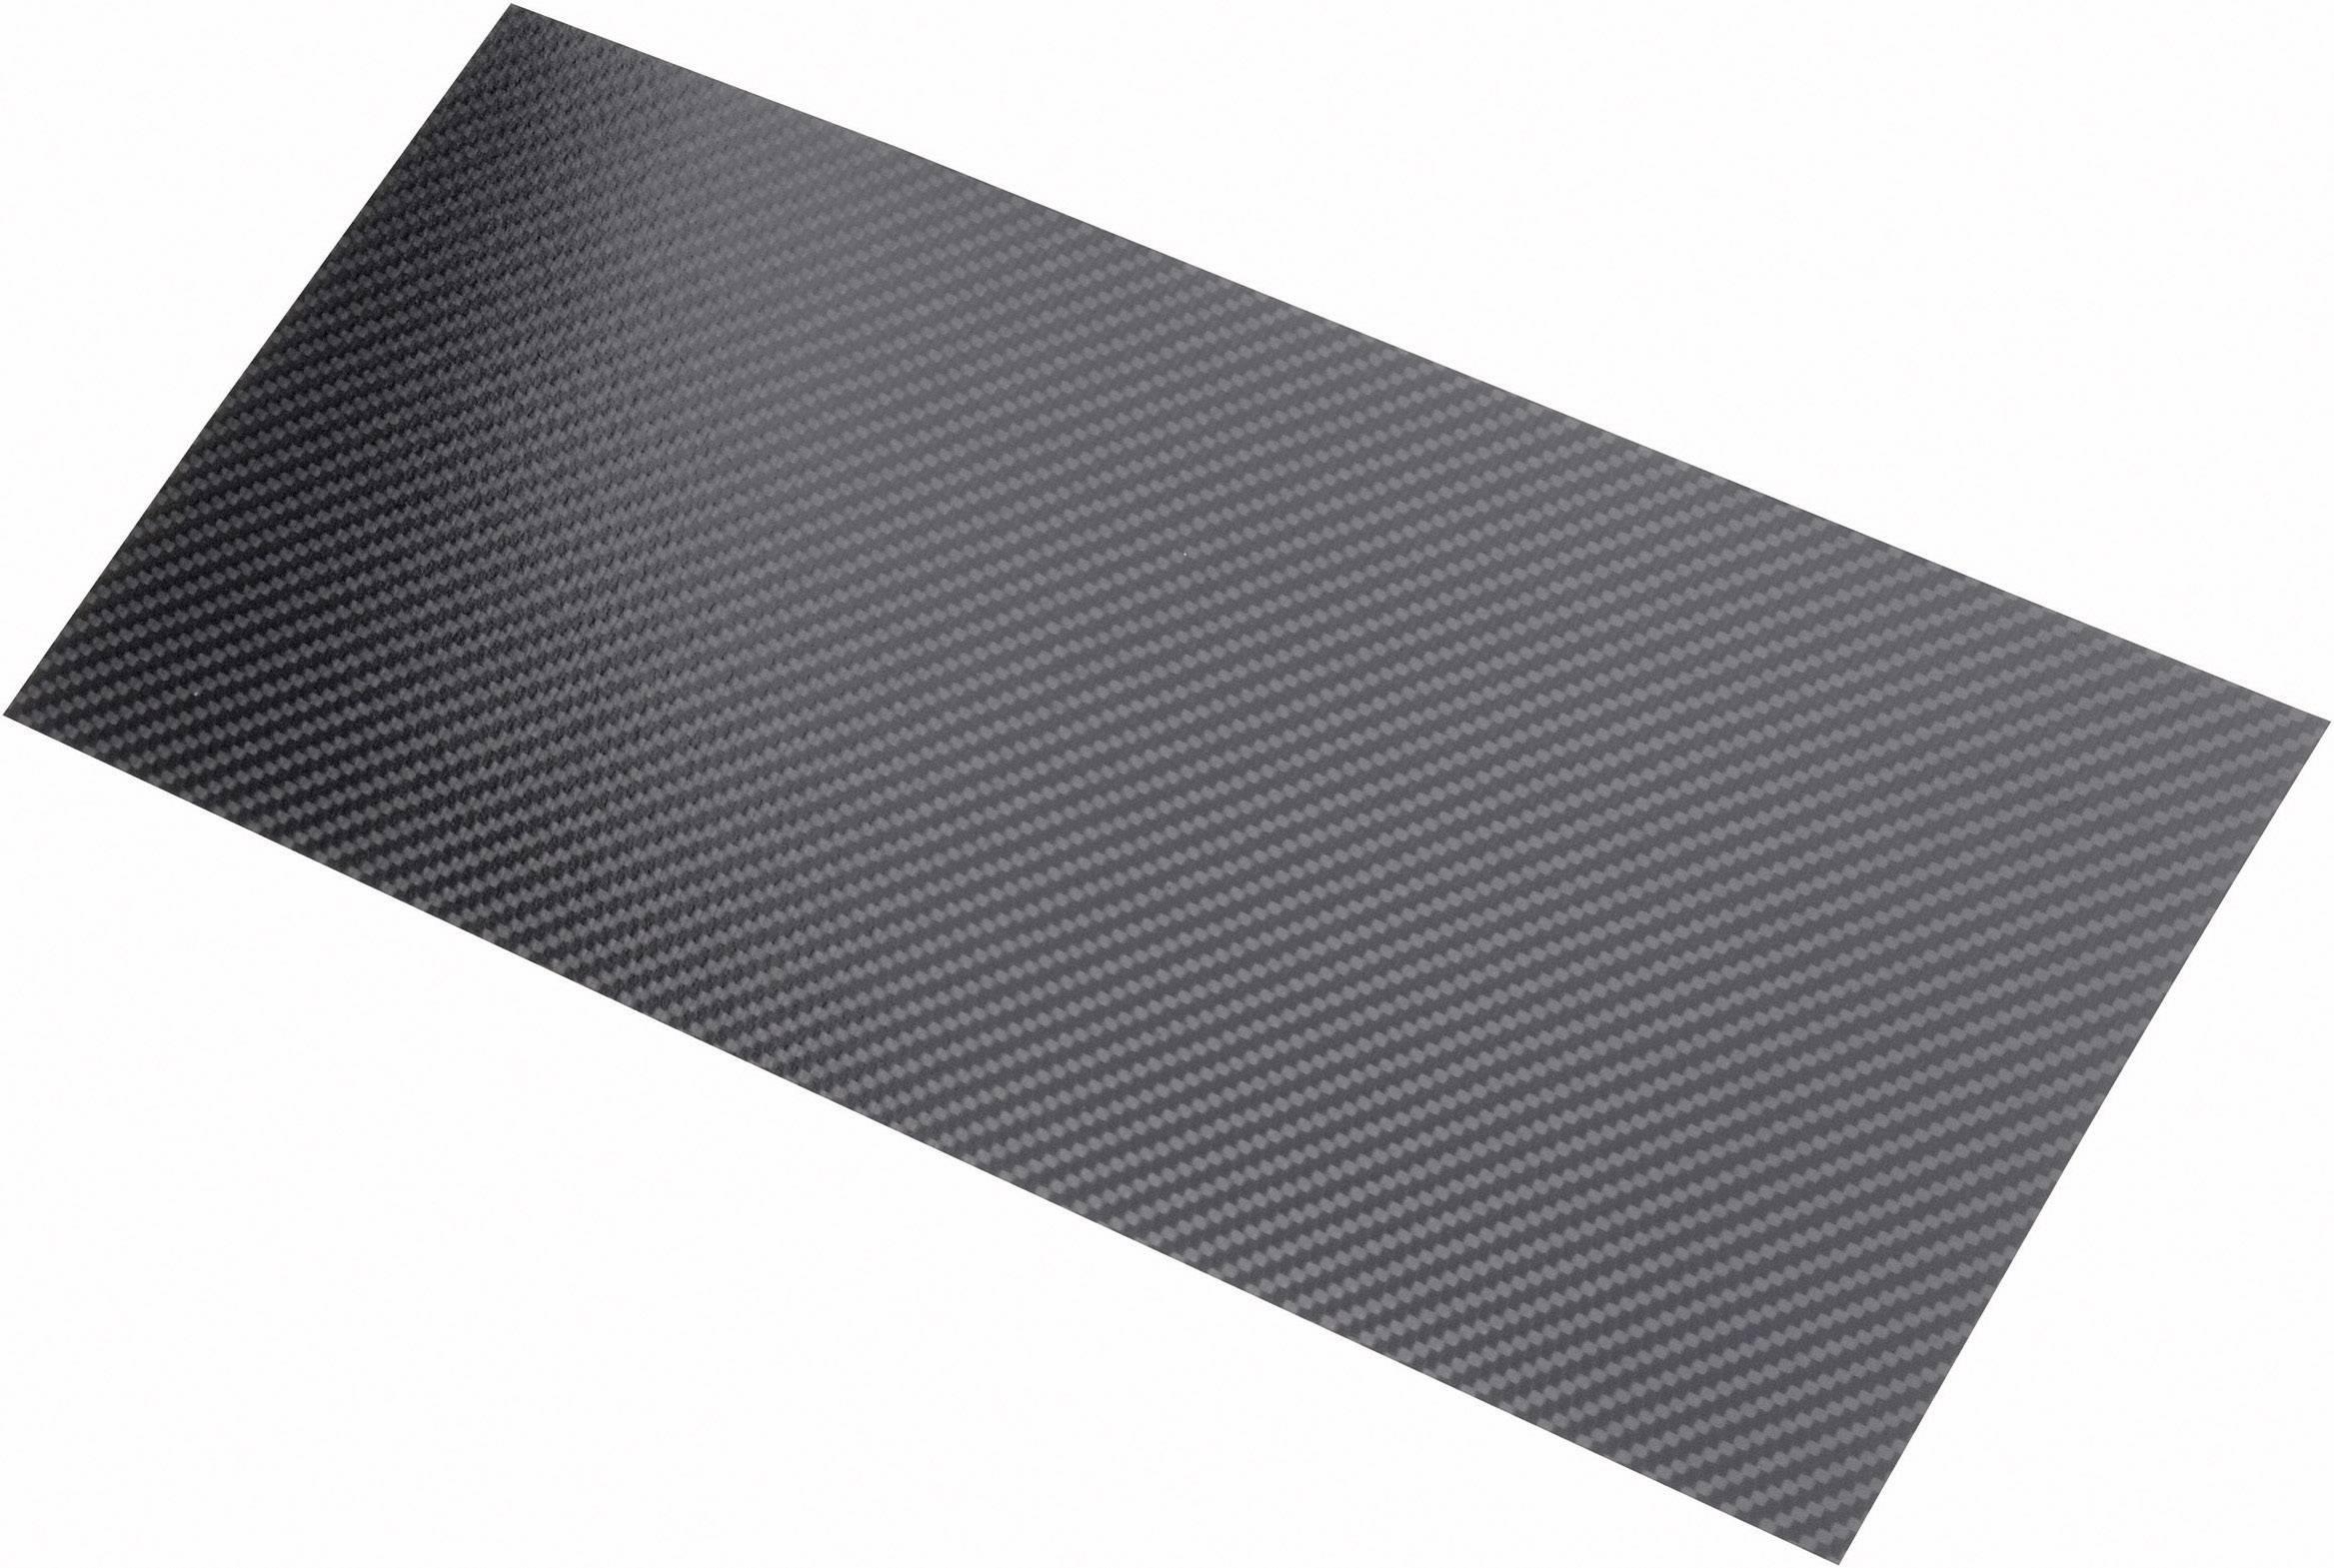 Karbonová deska Carbotec 231664, (d x š) 340 mm x 150 mm x 0.55 mm